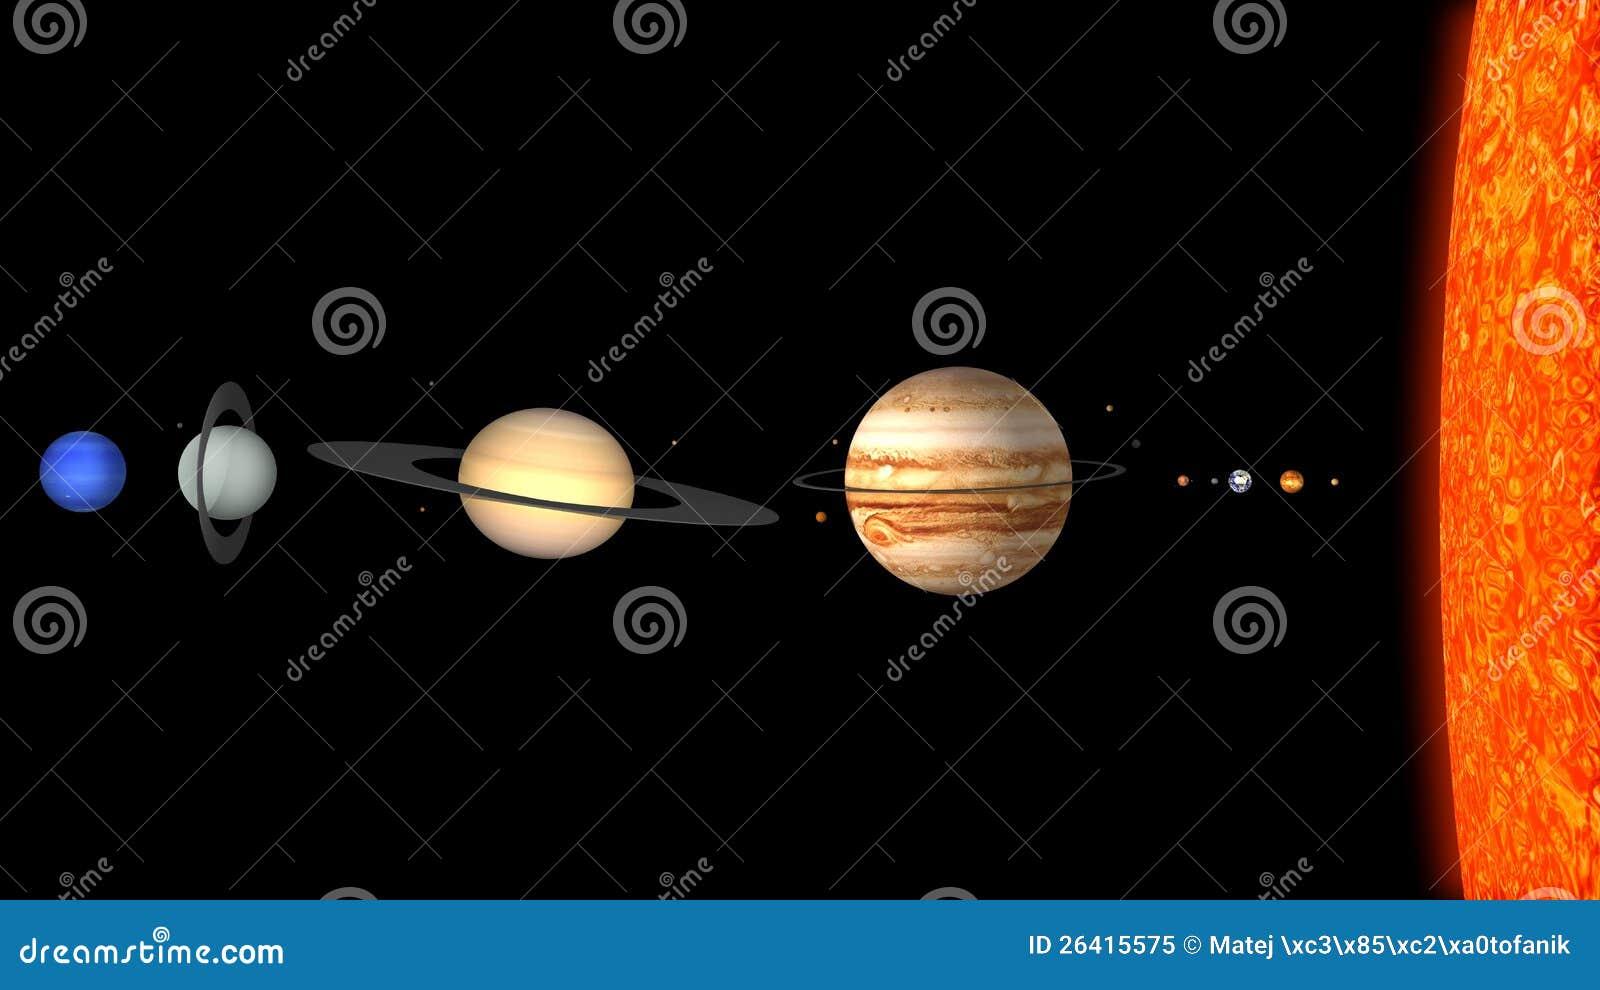 solar system dimensions - photo #46